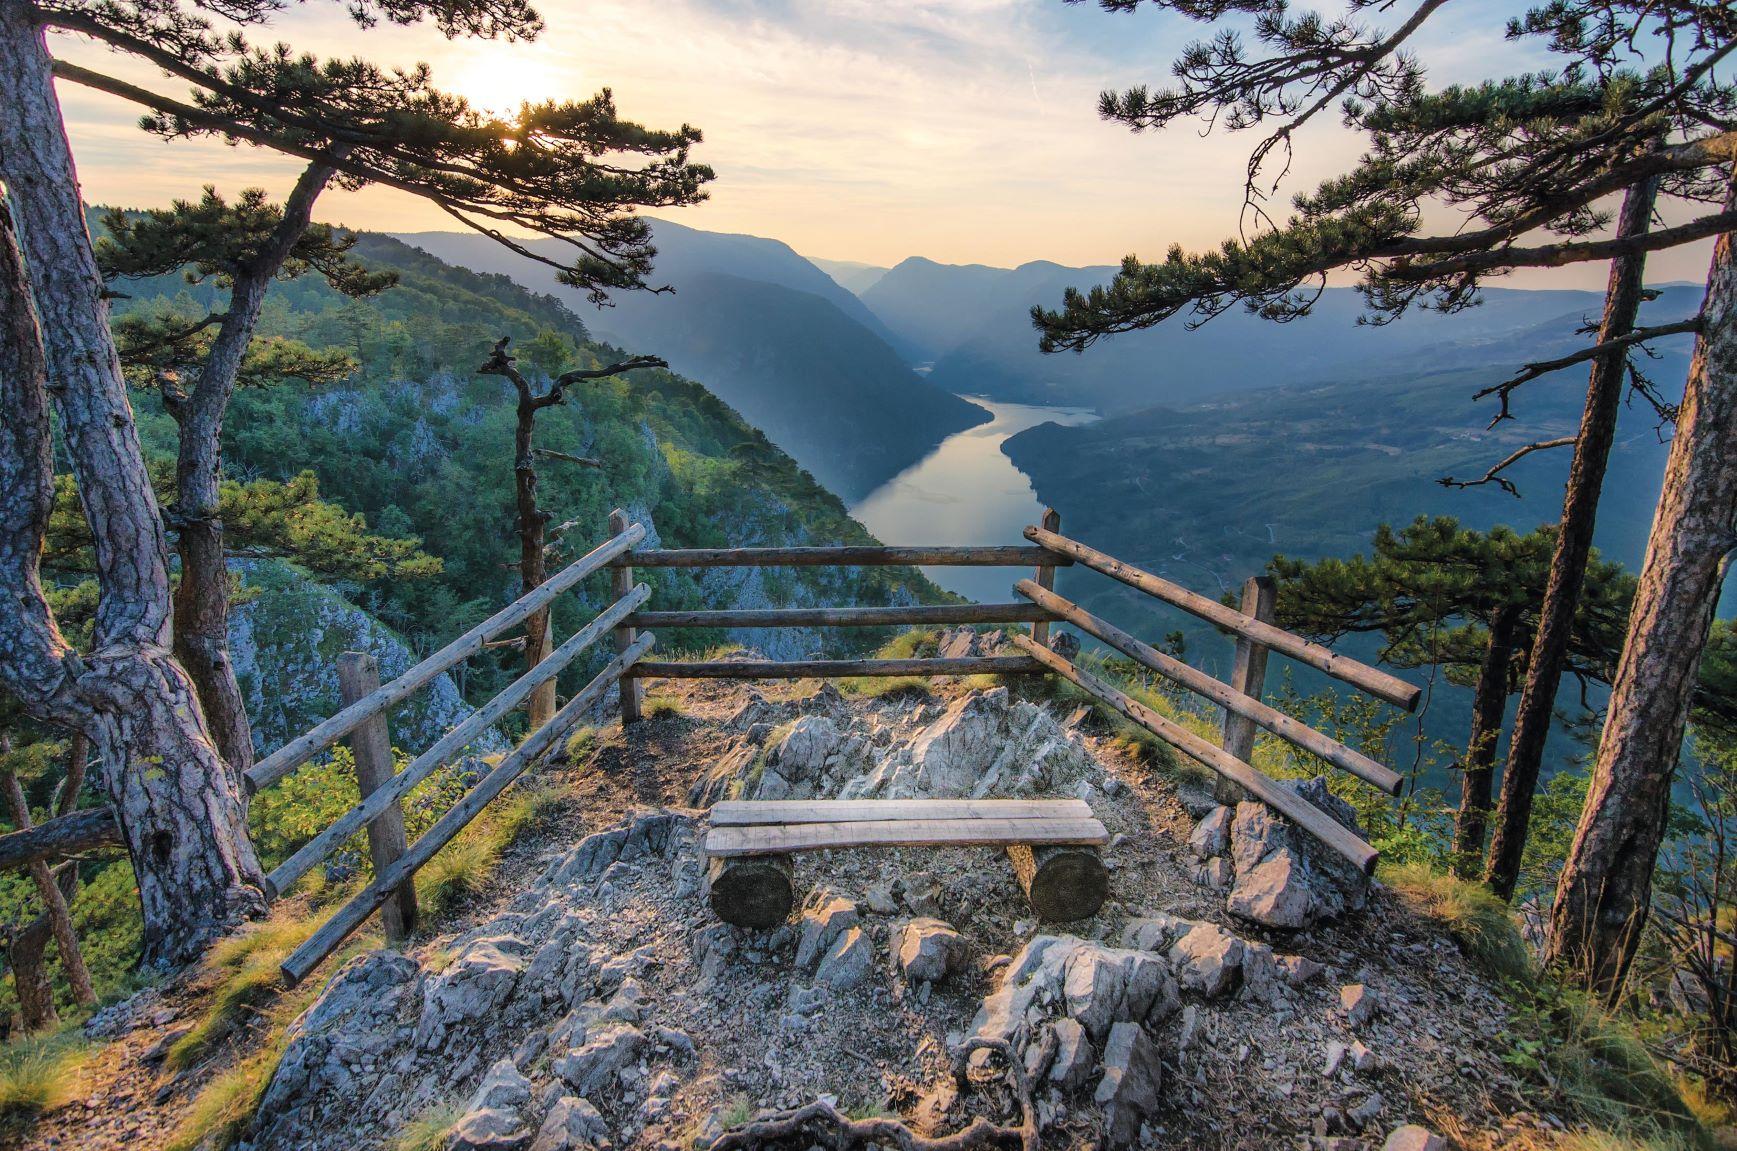 https://bsl.com.mt/wp-content/uploads/2021/04/serbian-lakes.jpg